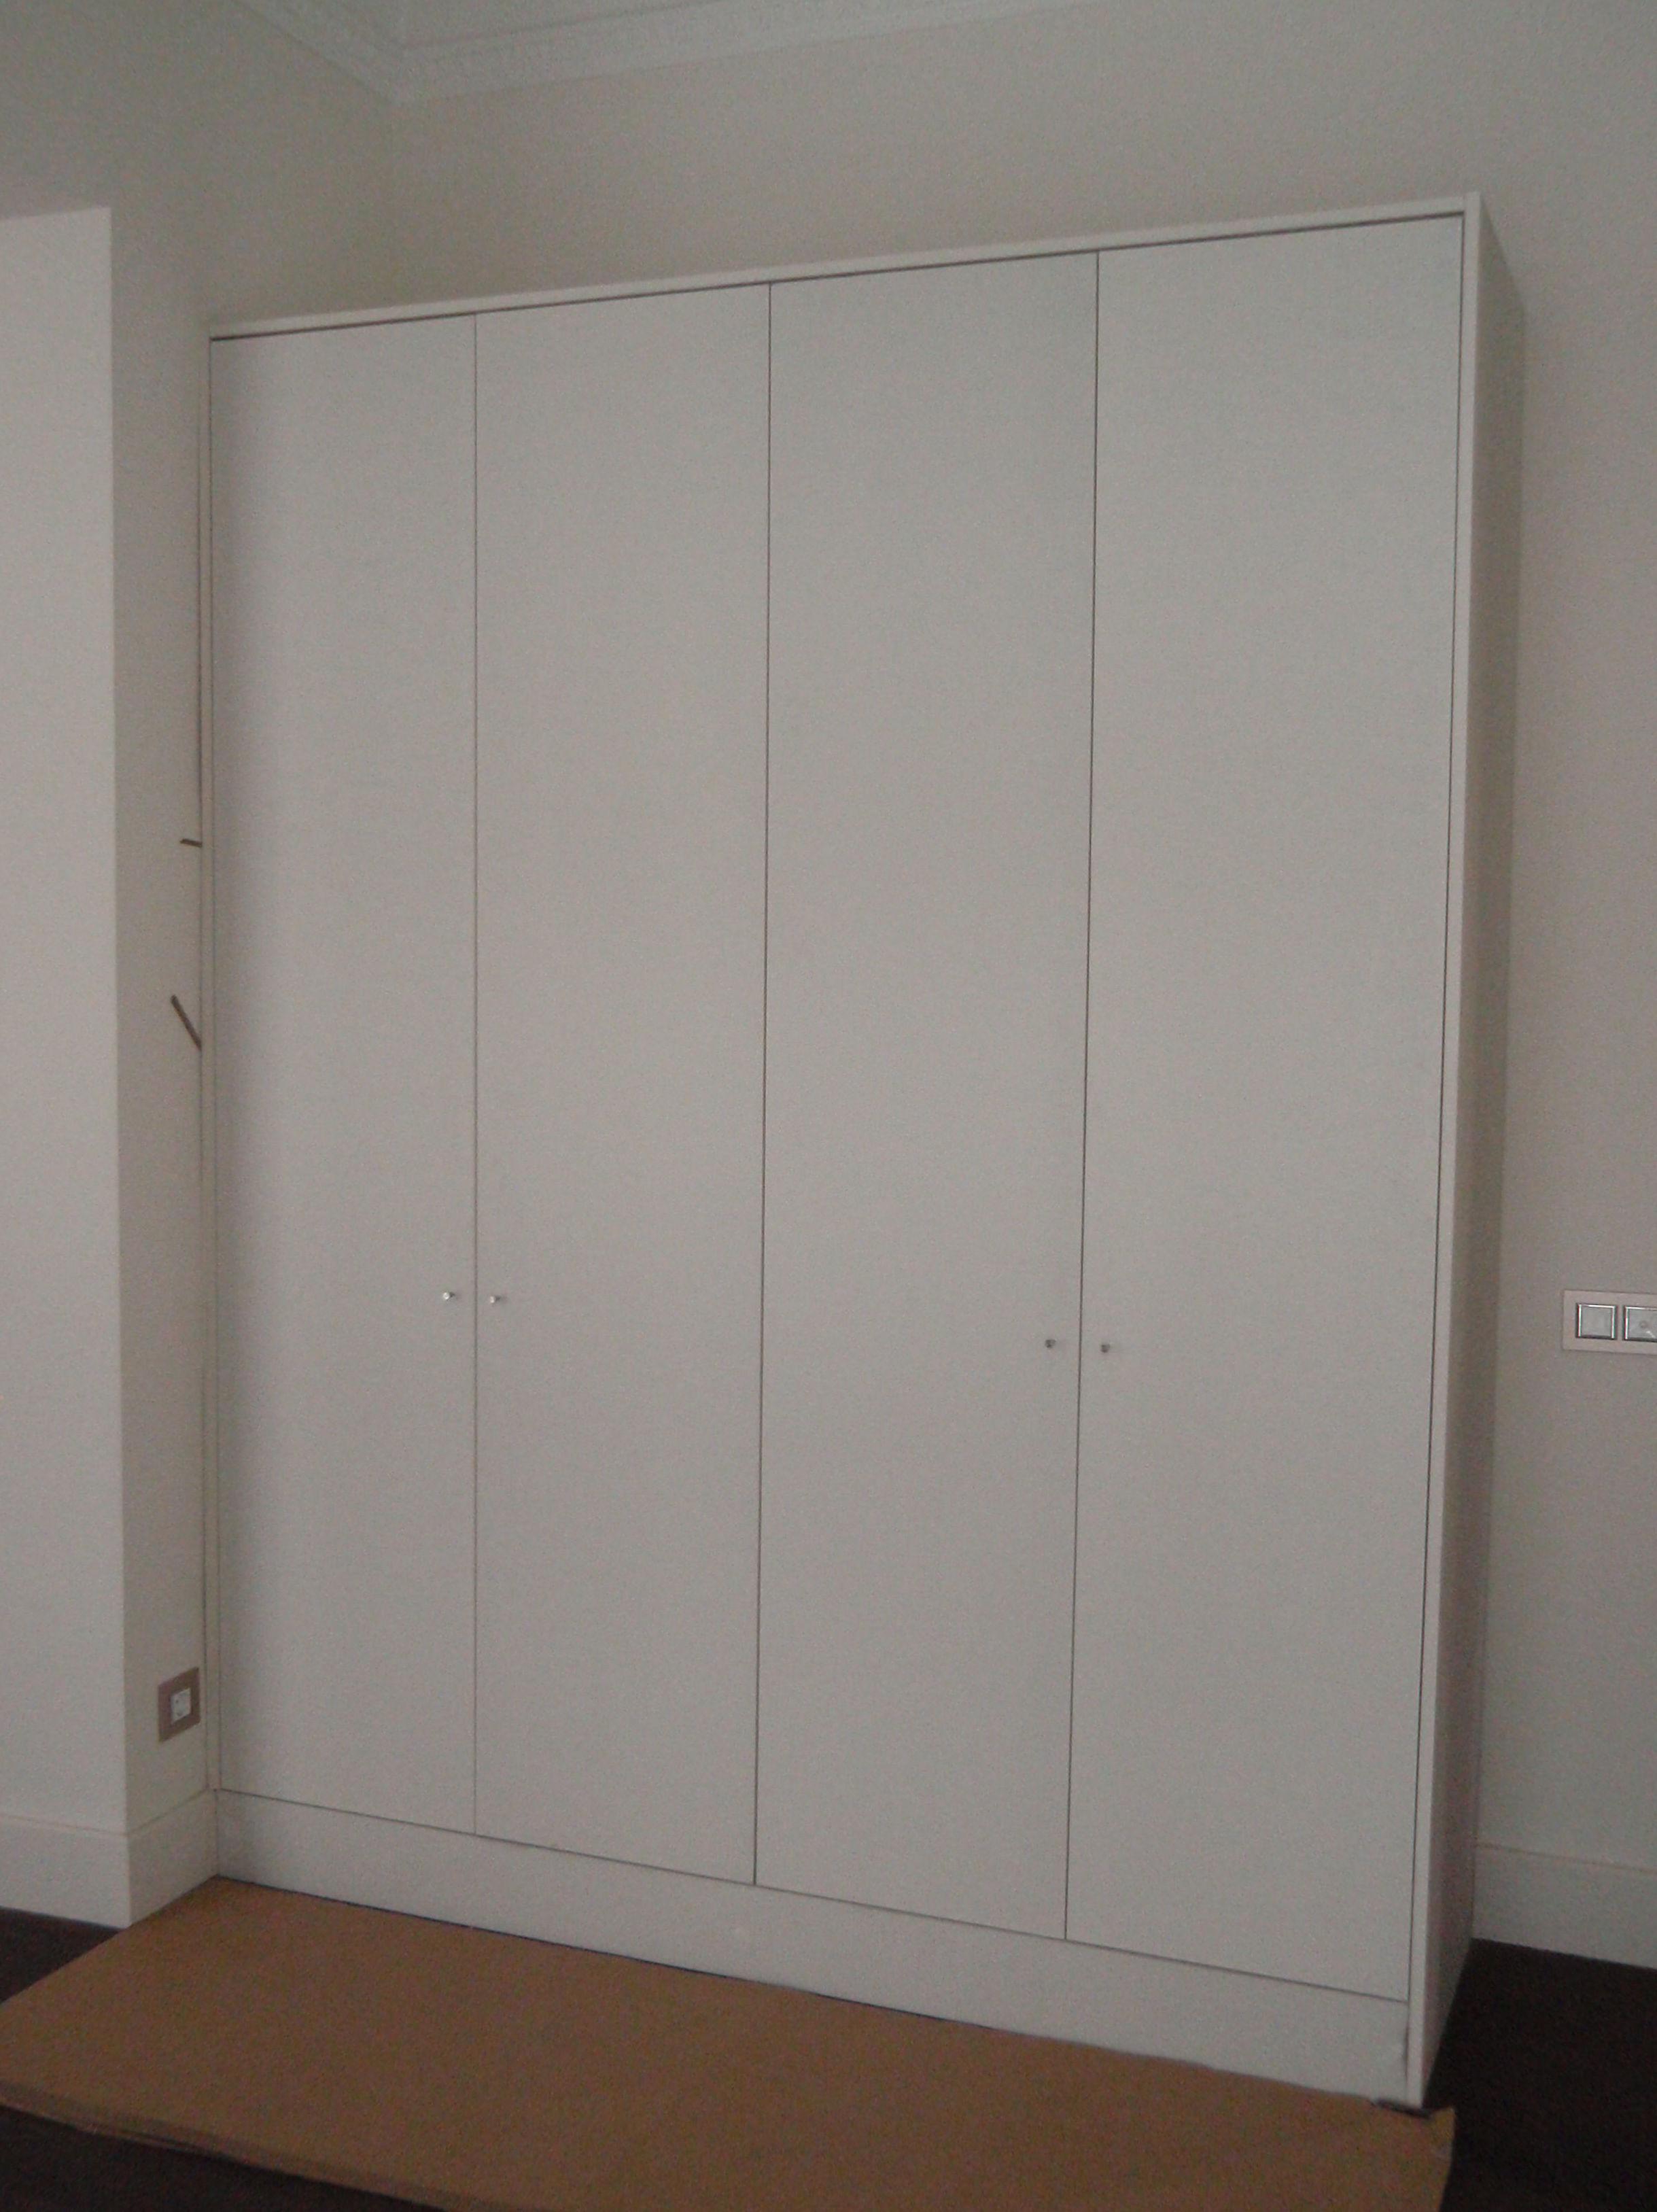 Realización de armarios de madera para diversos espacios